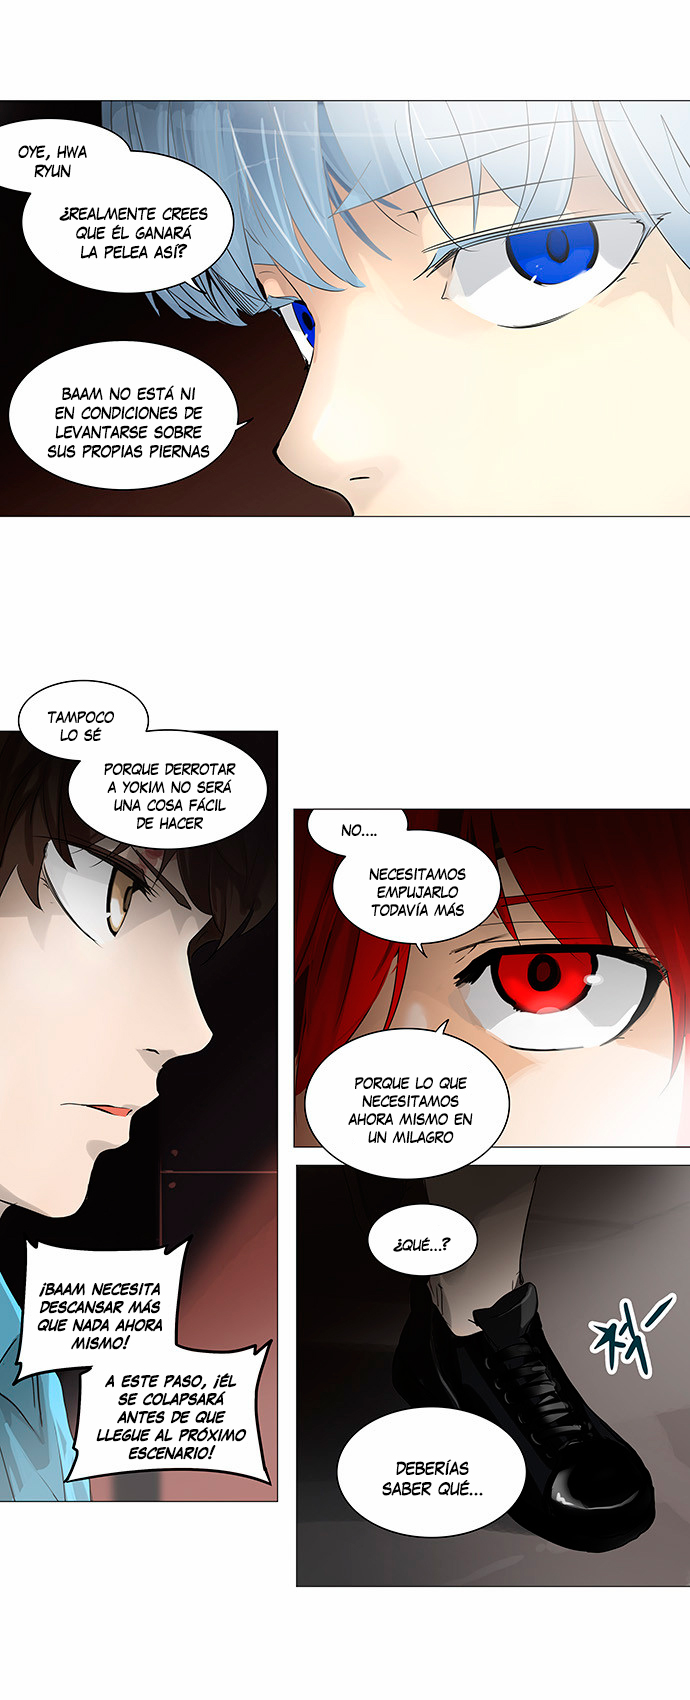 http://c5.ninemanga.com/es_manga/21/149/416028/32360cc376d9eccccb1fe41583e4eabc.jpg Page 7